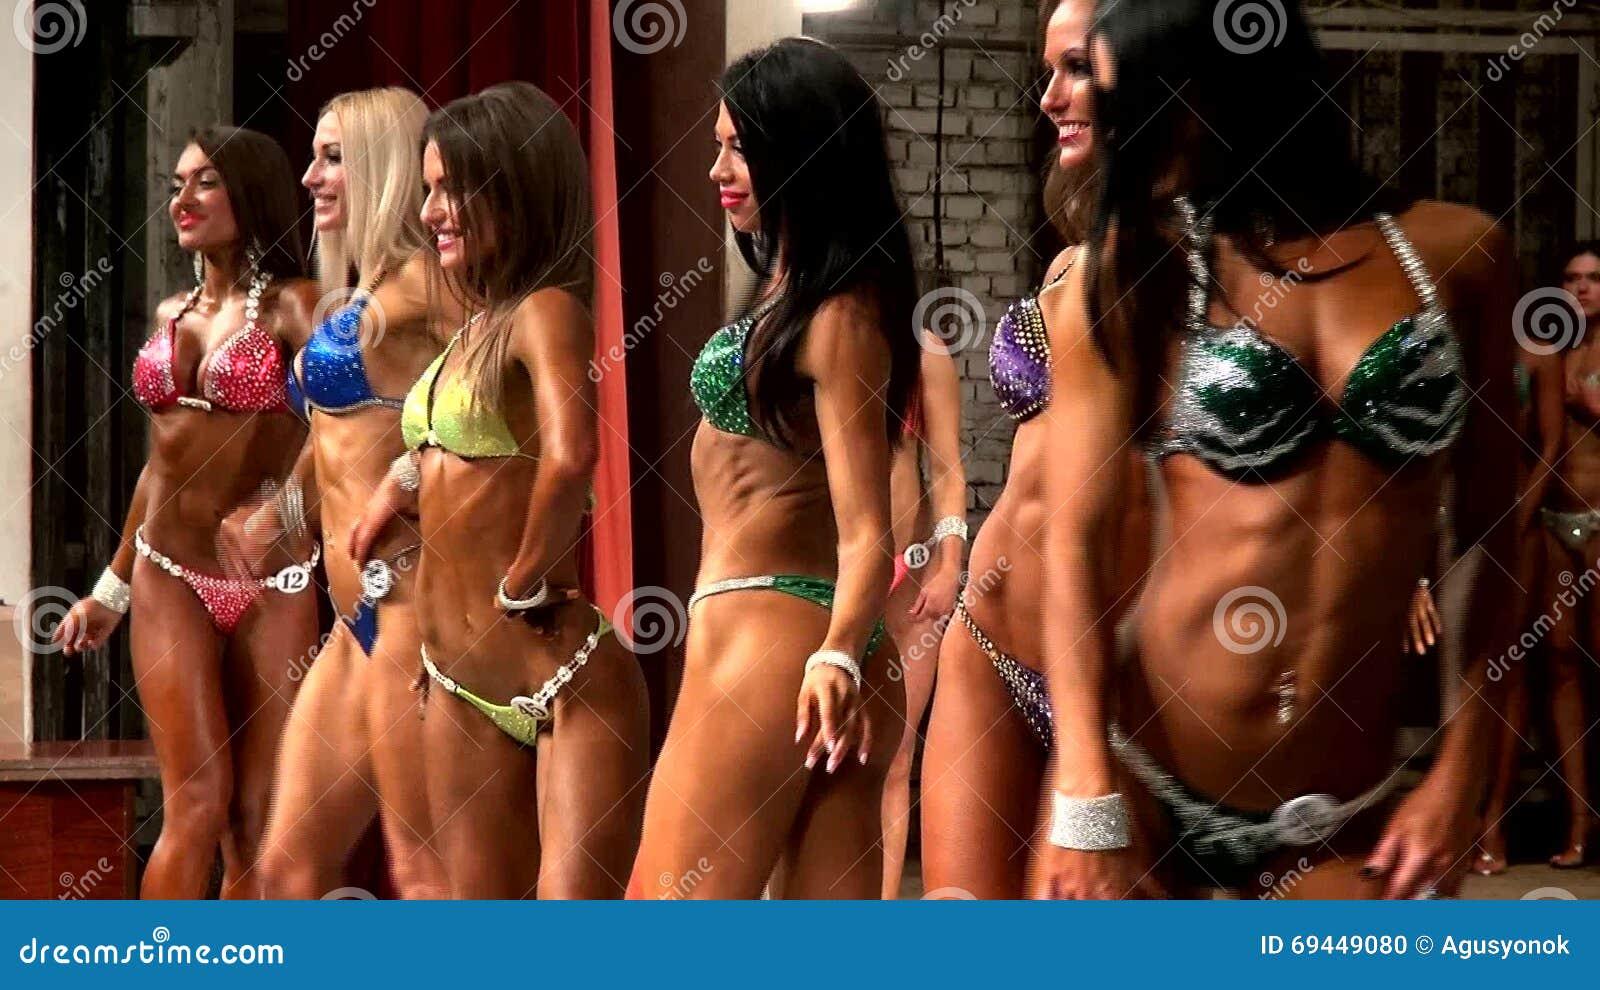 Nude image small school girls